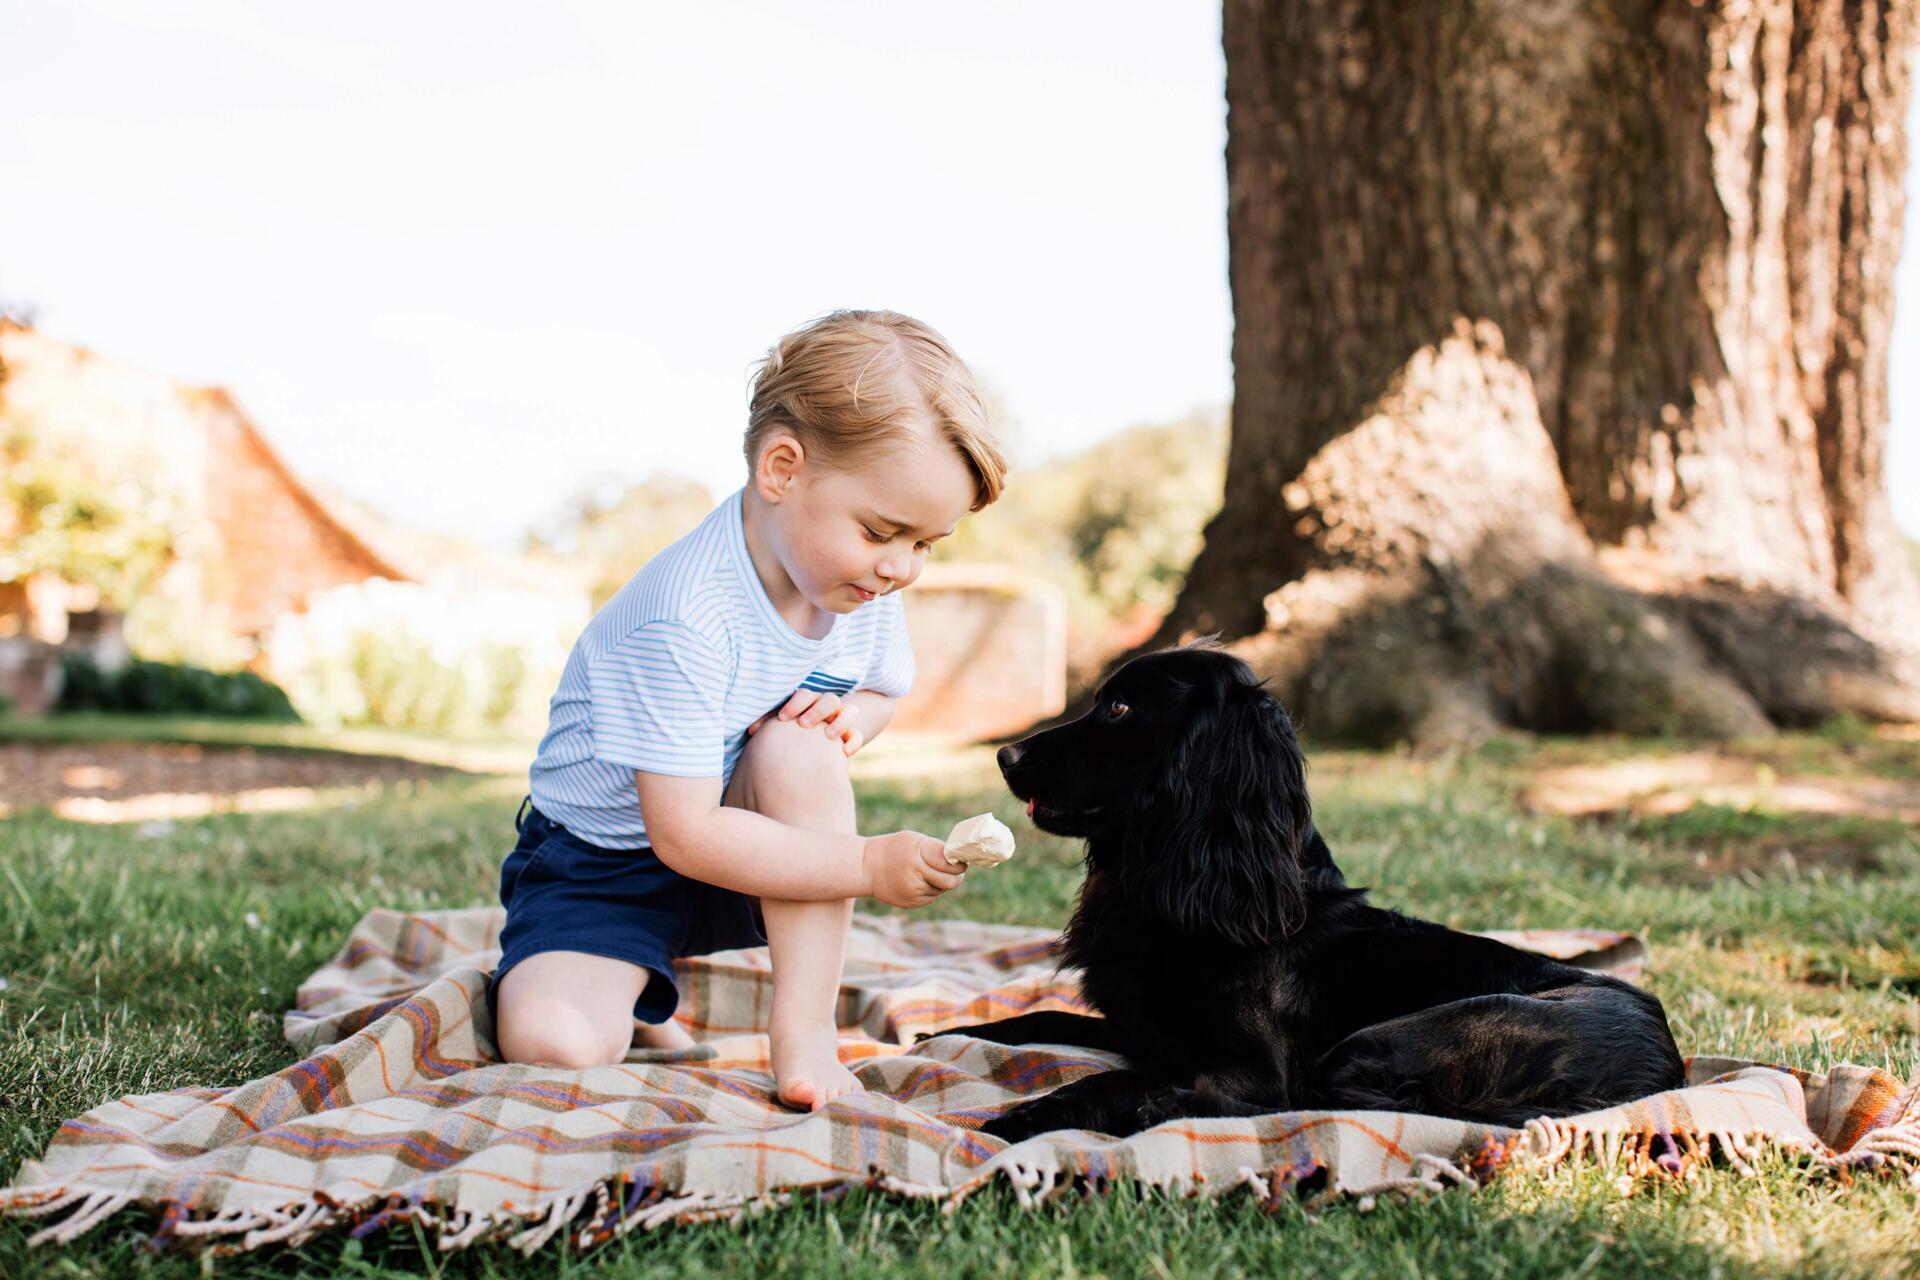 Bild zu Prinz George, Hund, Eis, Geburtstag